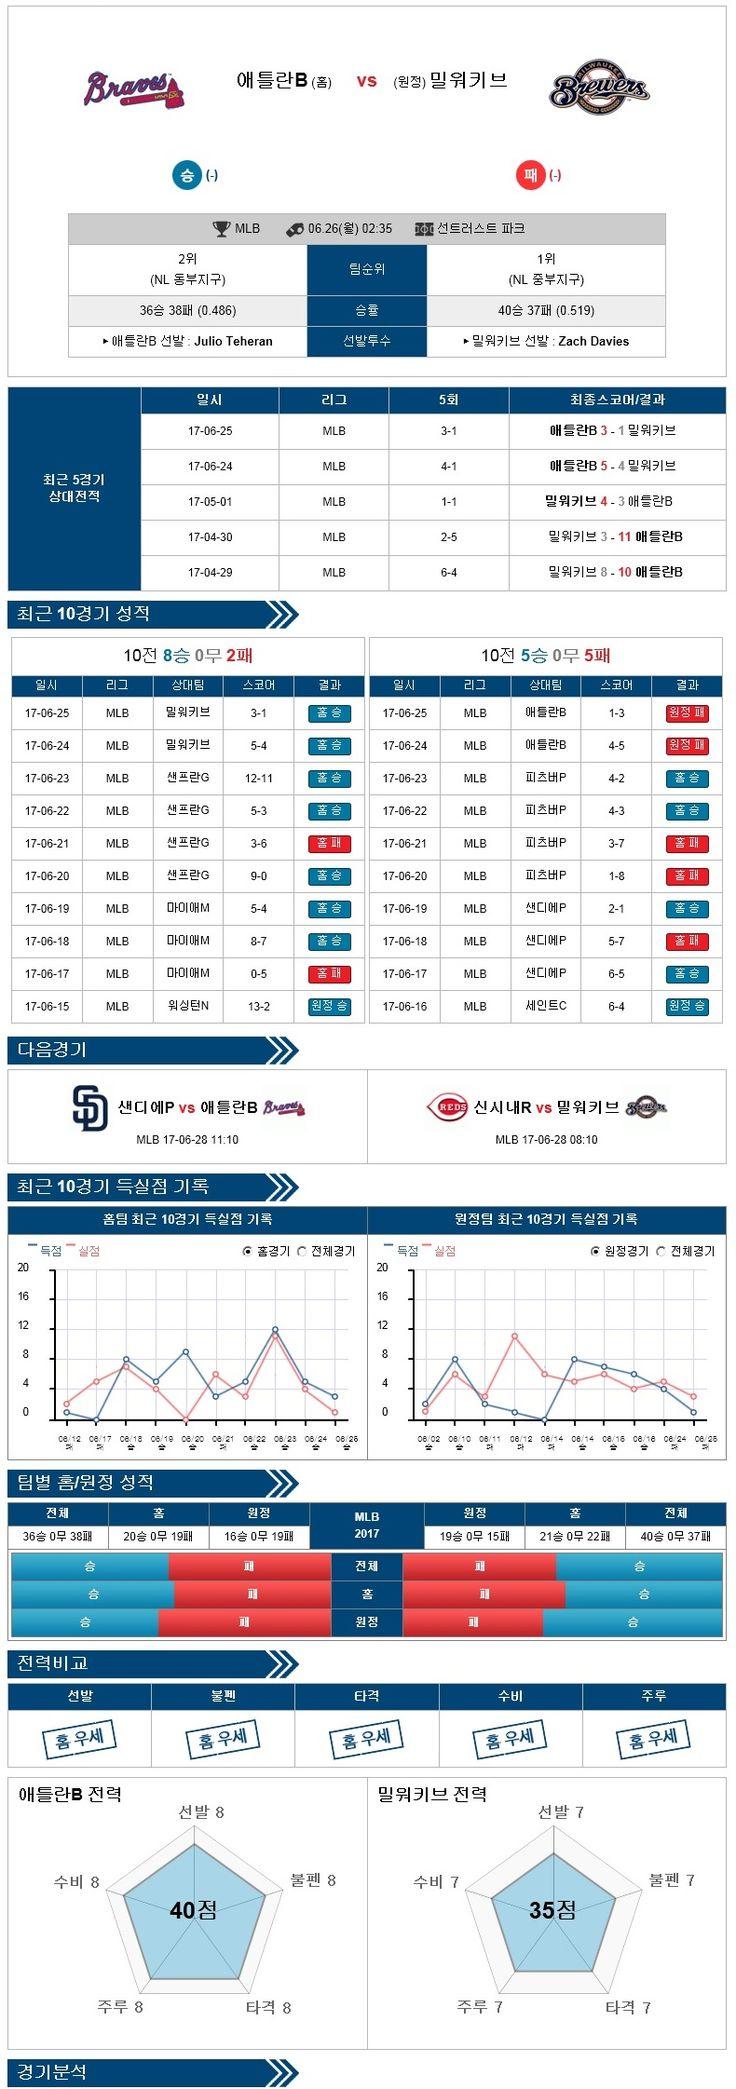 [MLB] 6월 26일 야구분석픽 애틀랜타 vs 밀워키 ★토토군 분석픽★